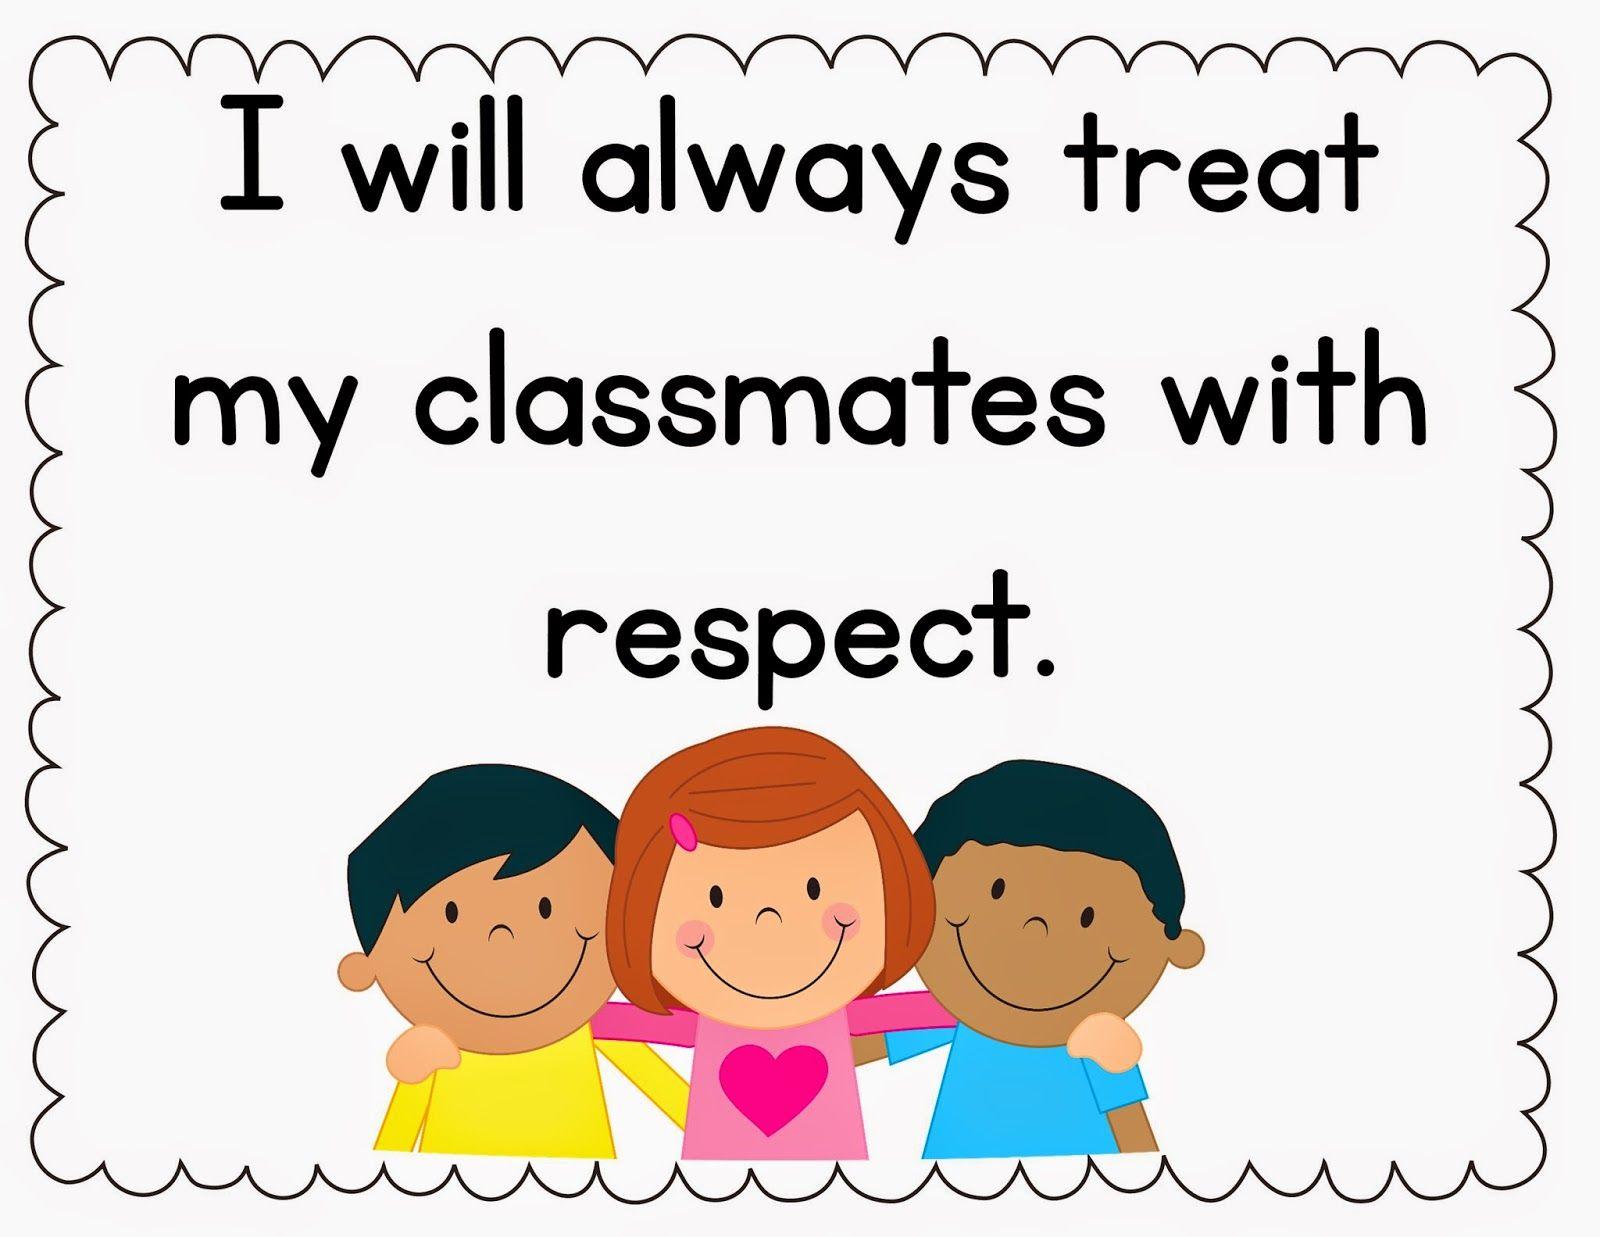 2nd grade snickerdoodles june 2014 school stuff icons pictures rh pinterest com au classroom rules clipart symbols preschool classroom rules clipart